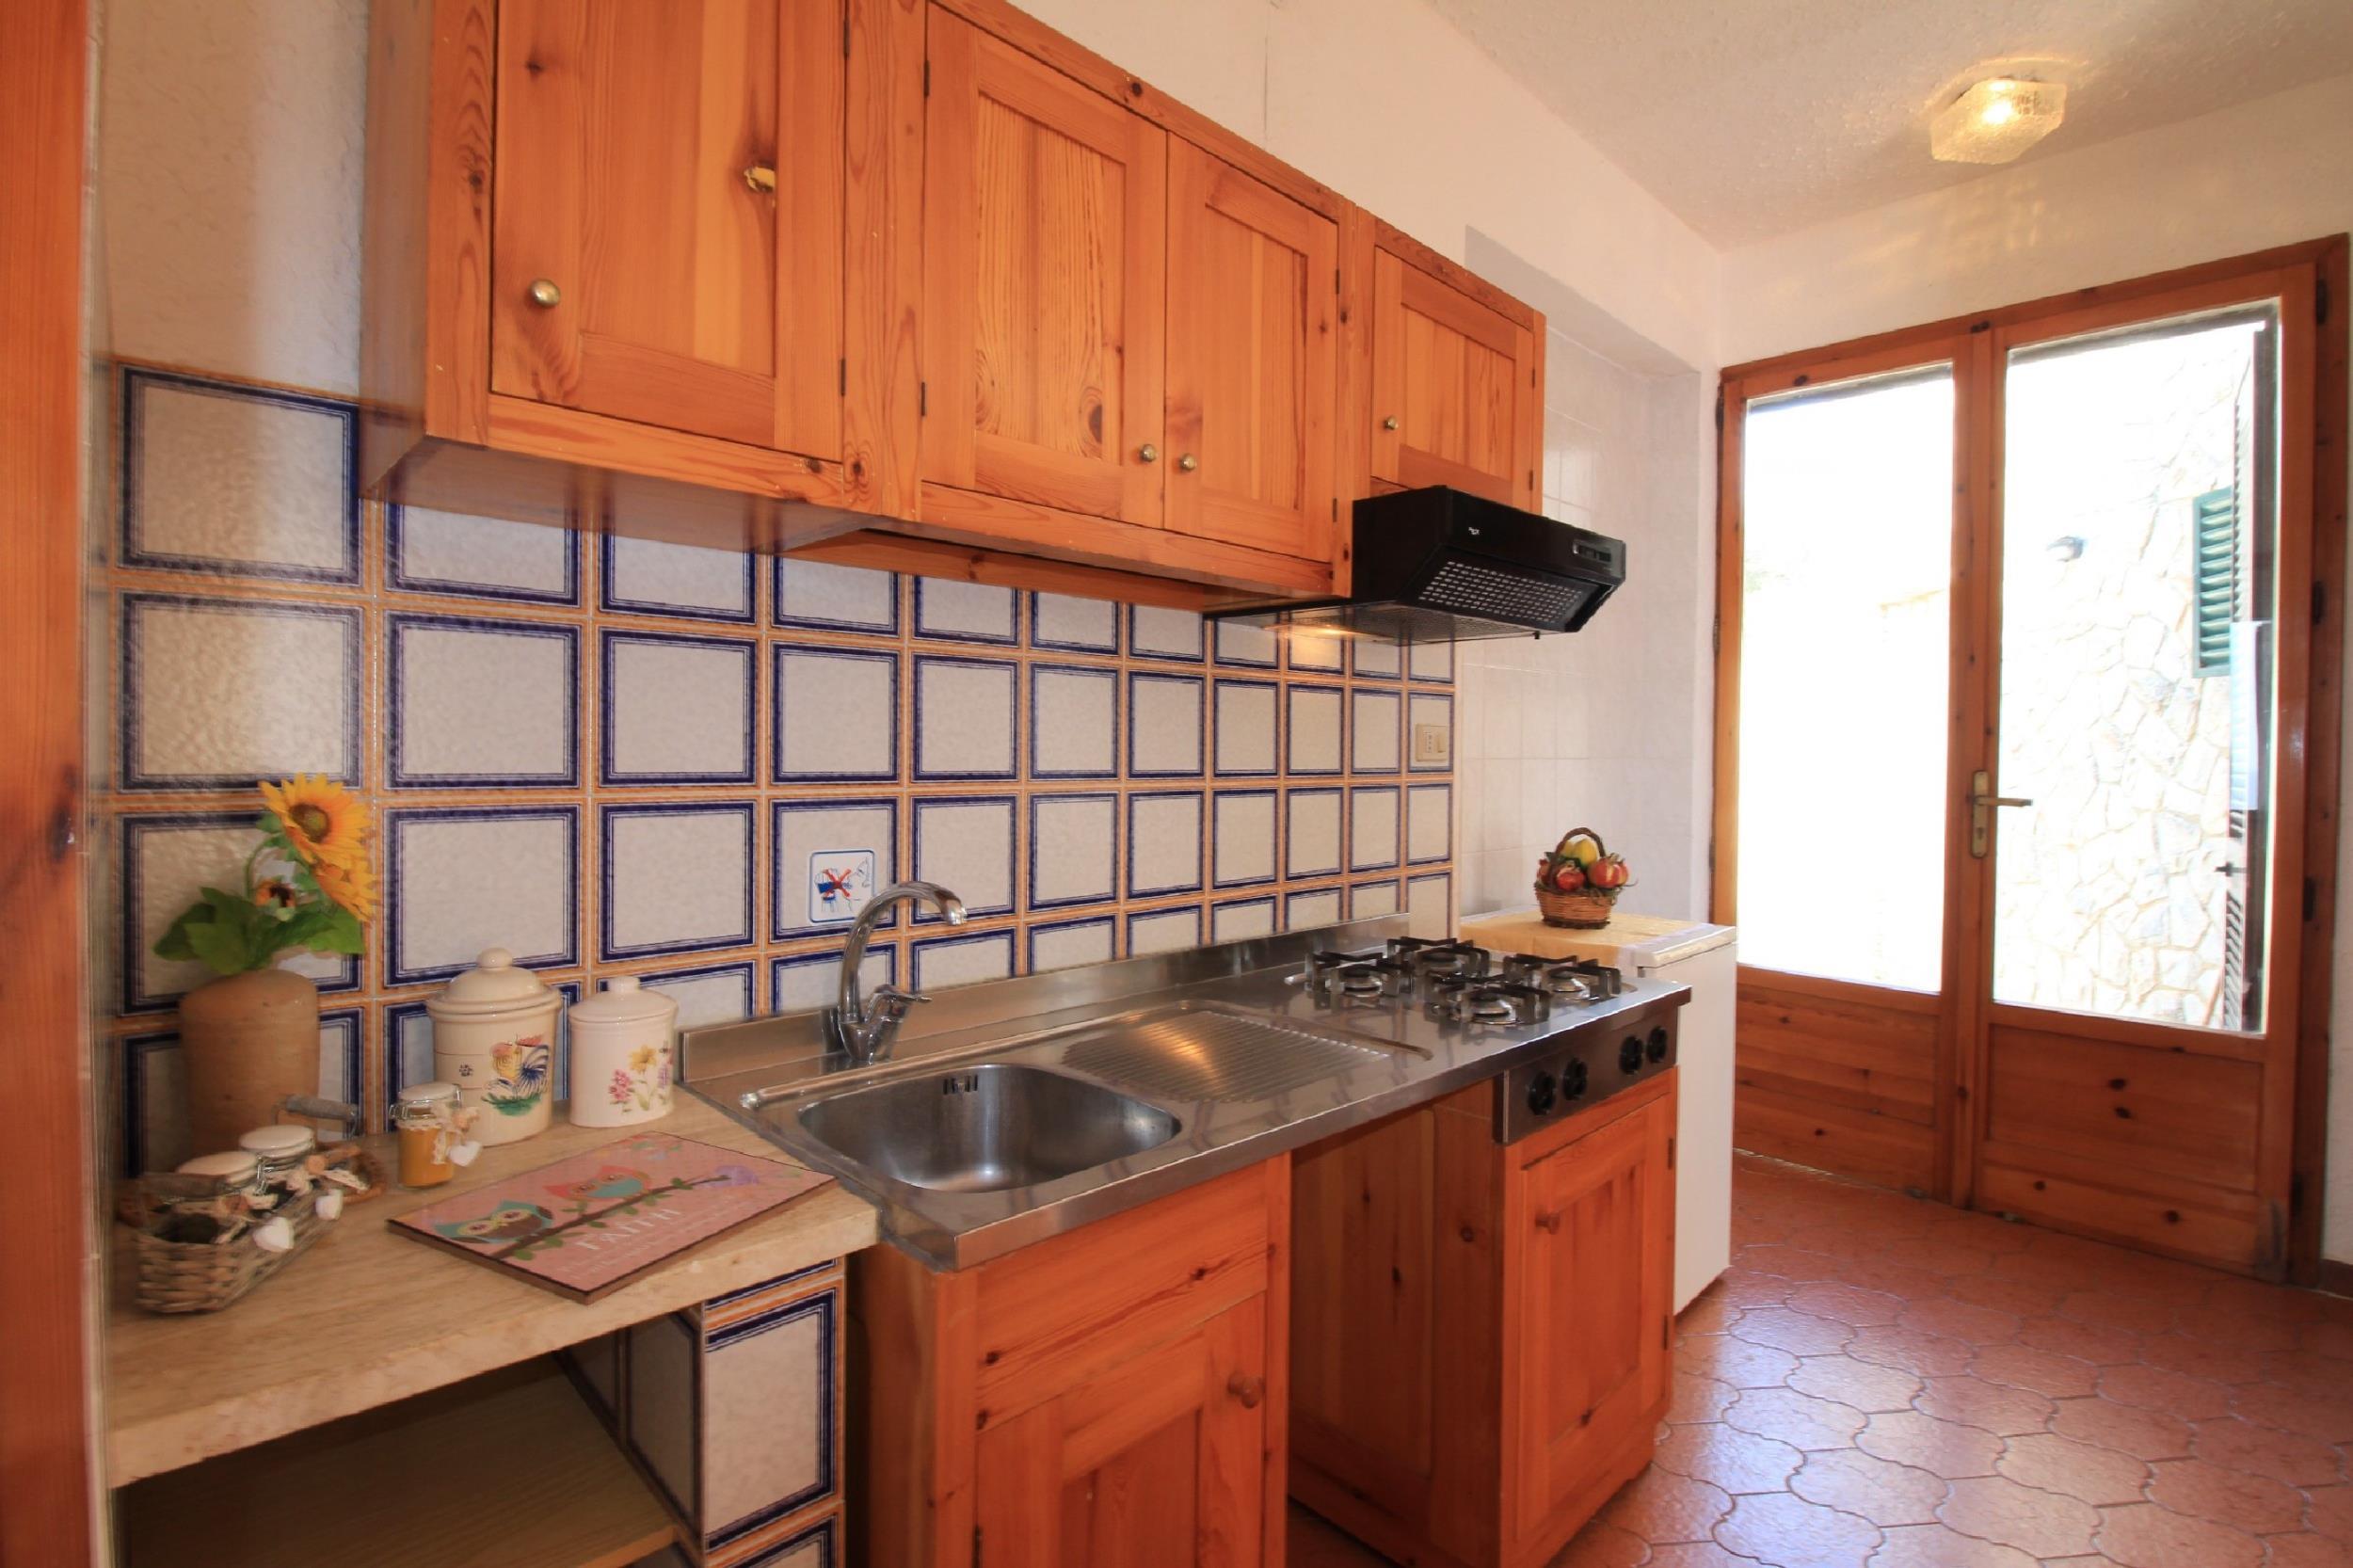 Apartment Archetti pool residence photo 22460075